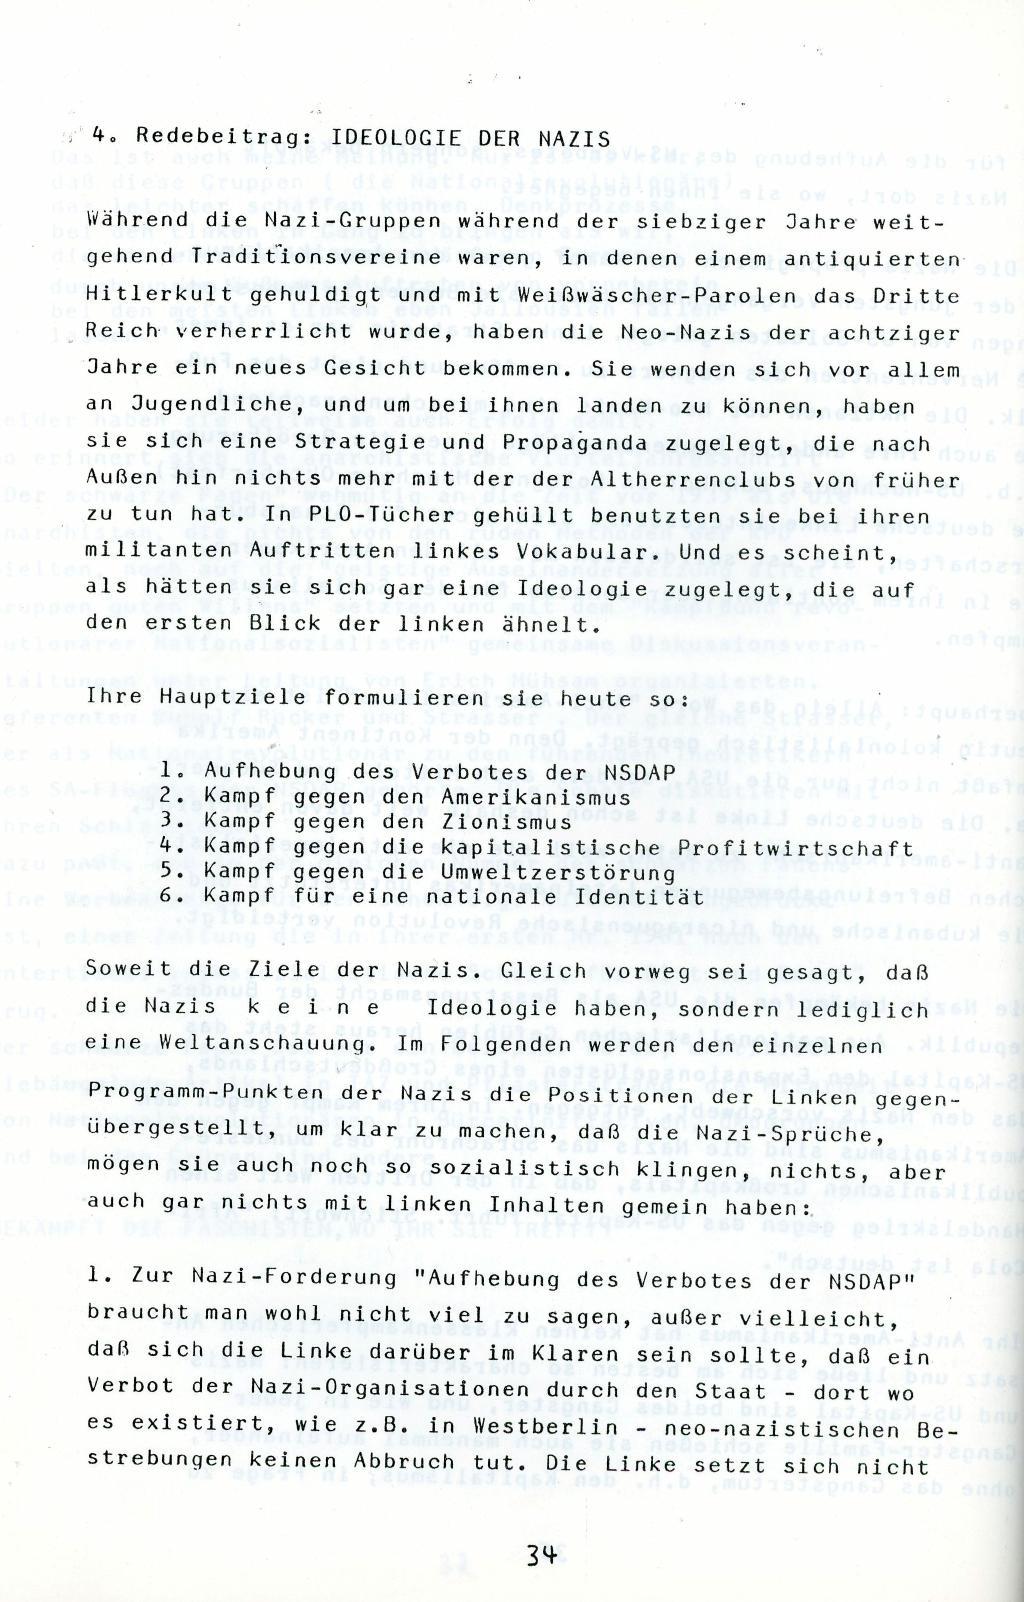 Berlin_1983_Autonome_Gruppen_Faschismus_im_Kapitalismus_34